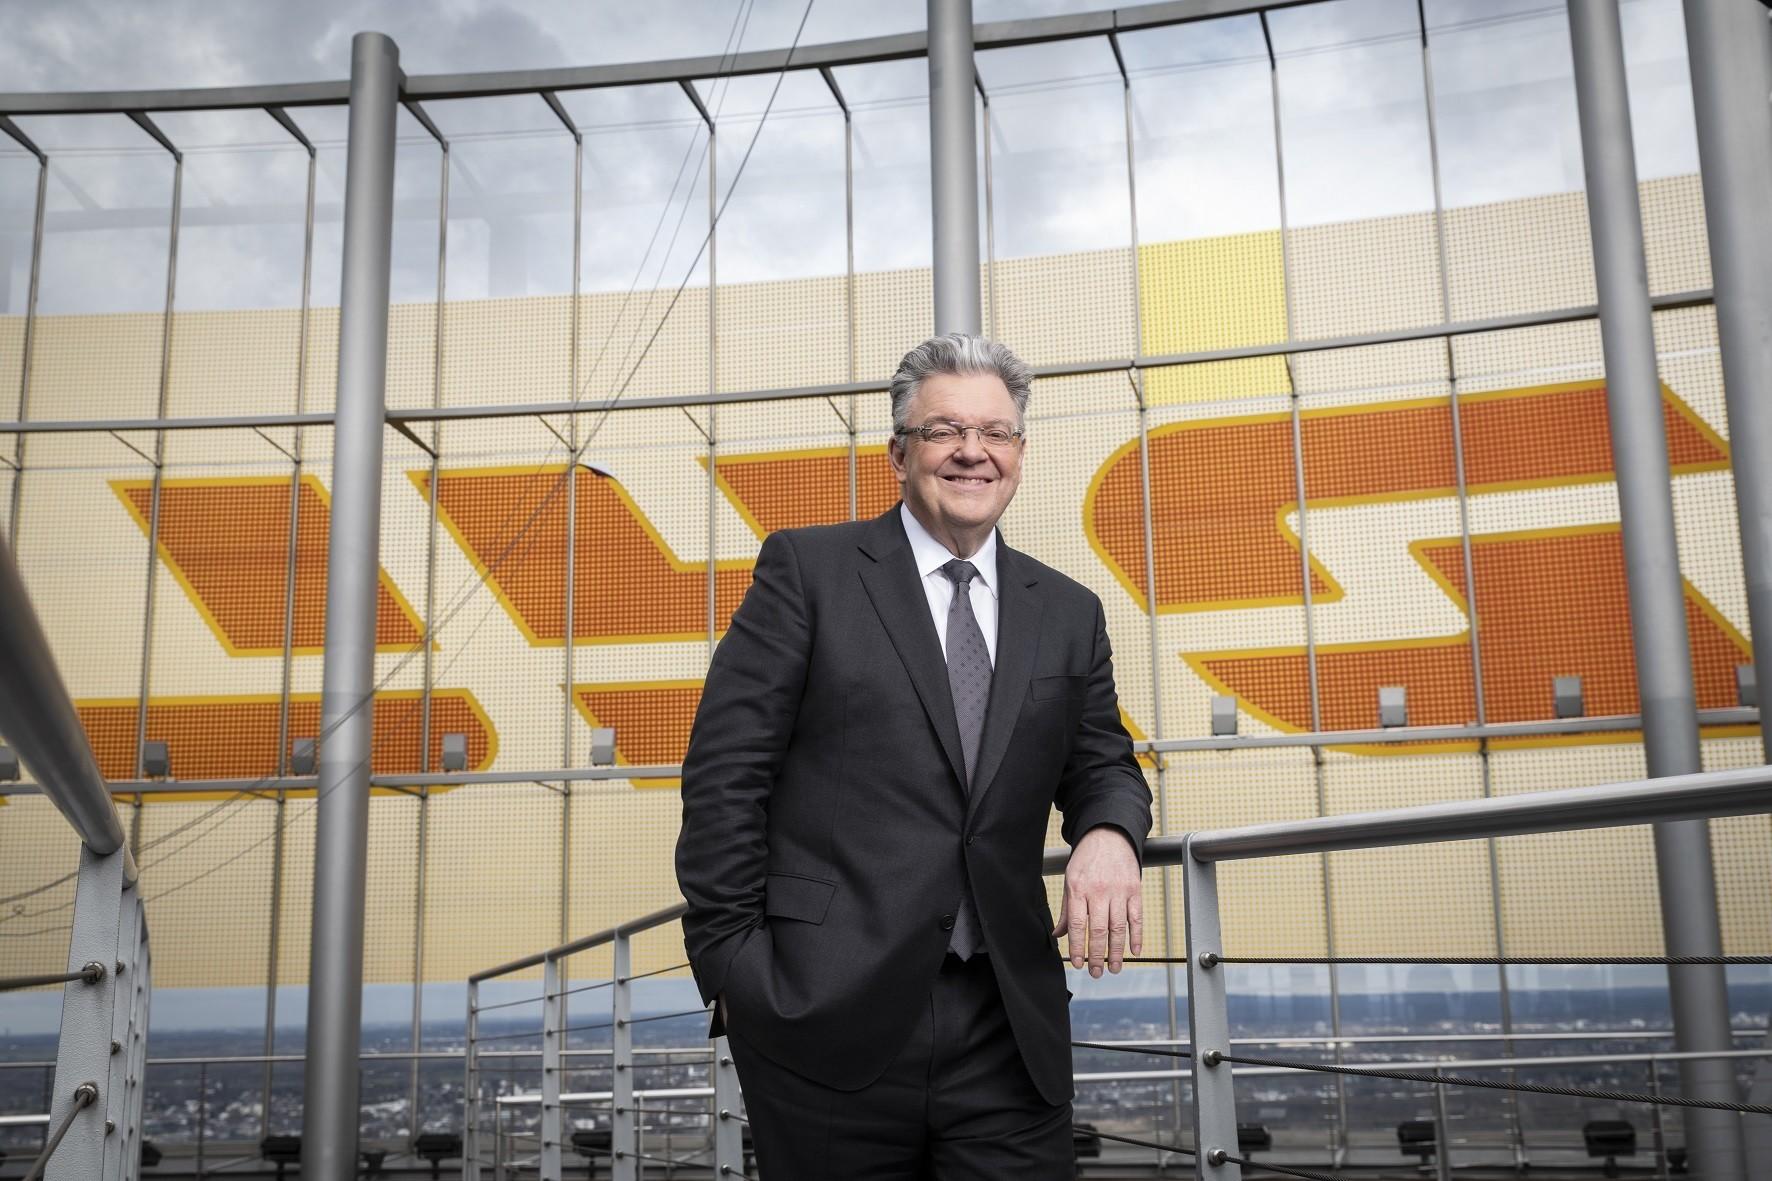 John Pearson, CEO of DHL Express